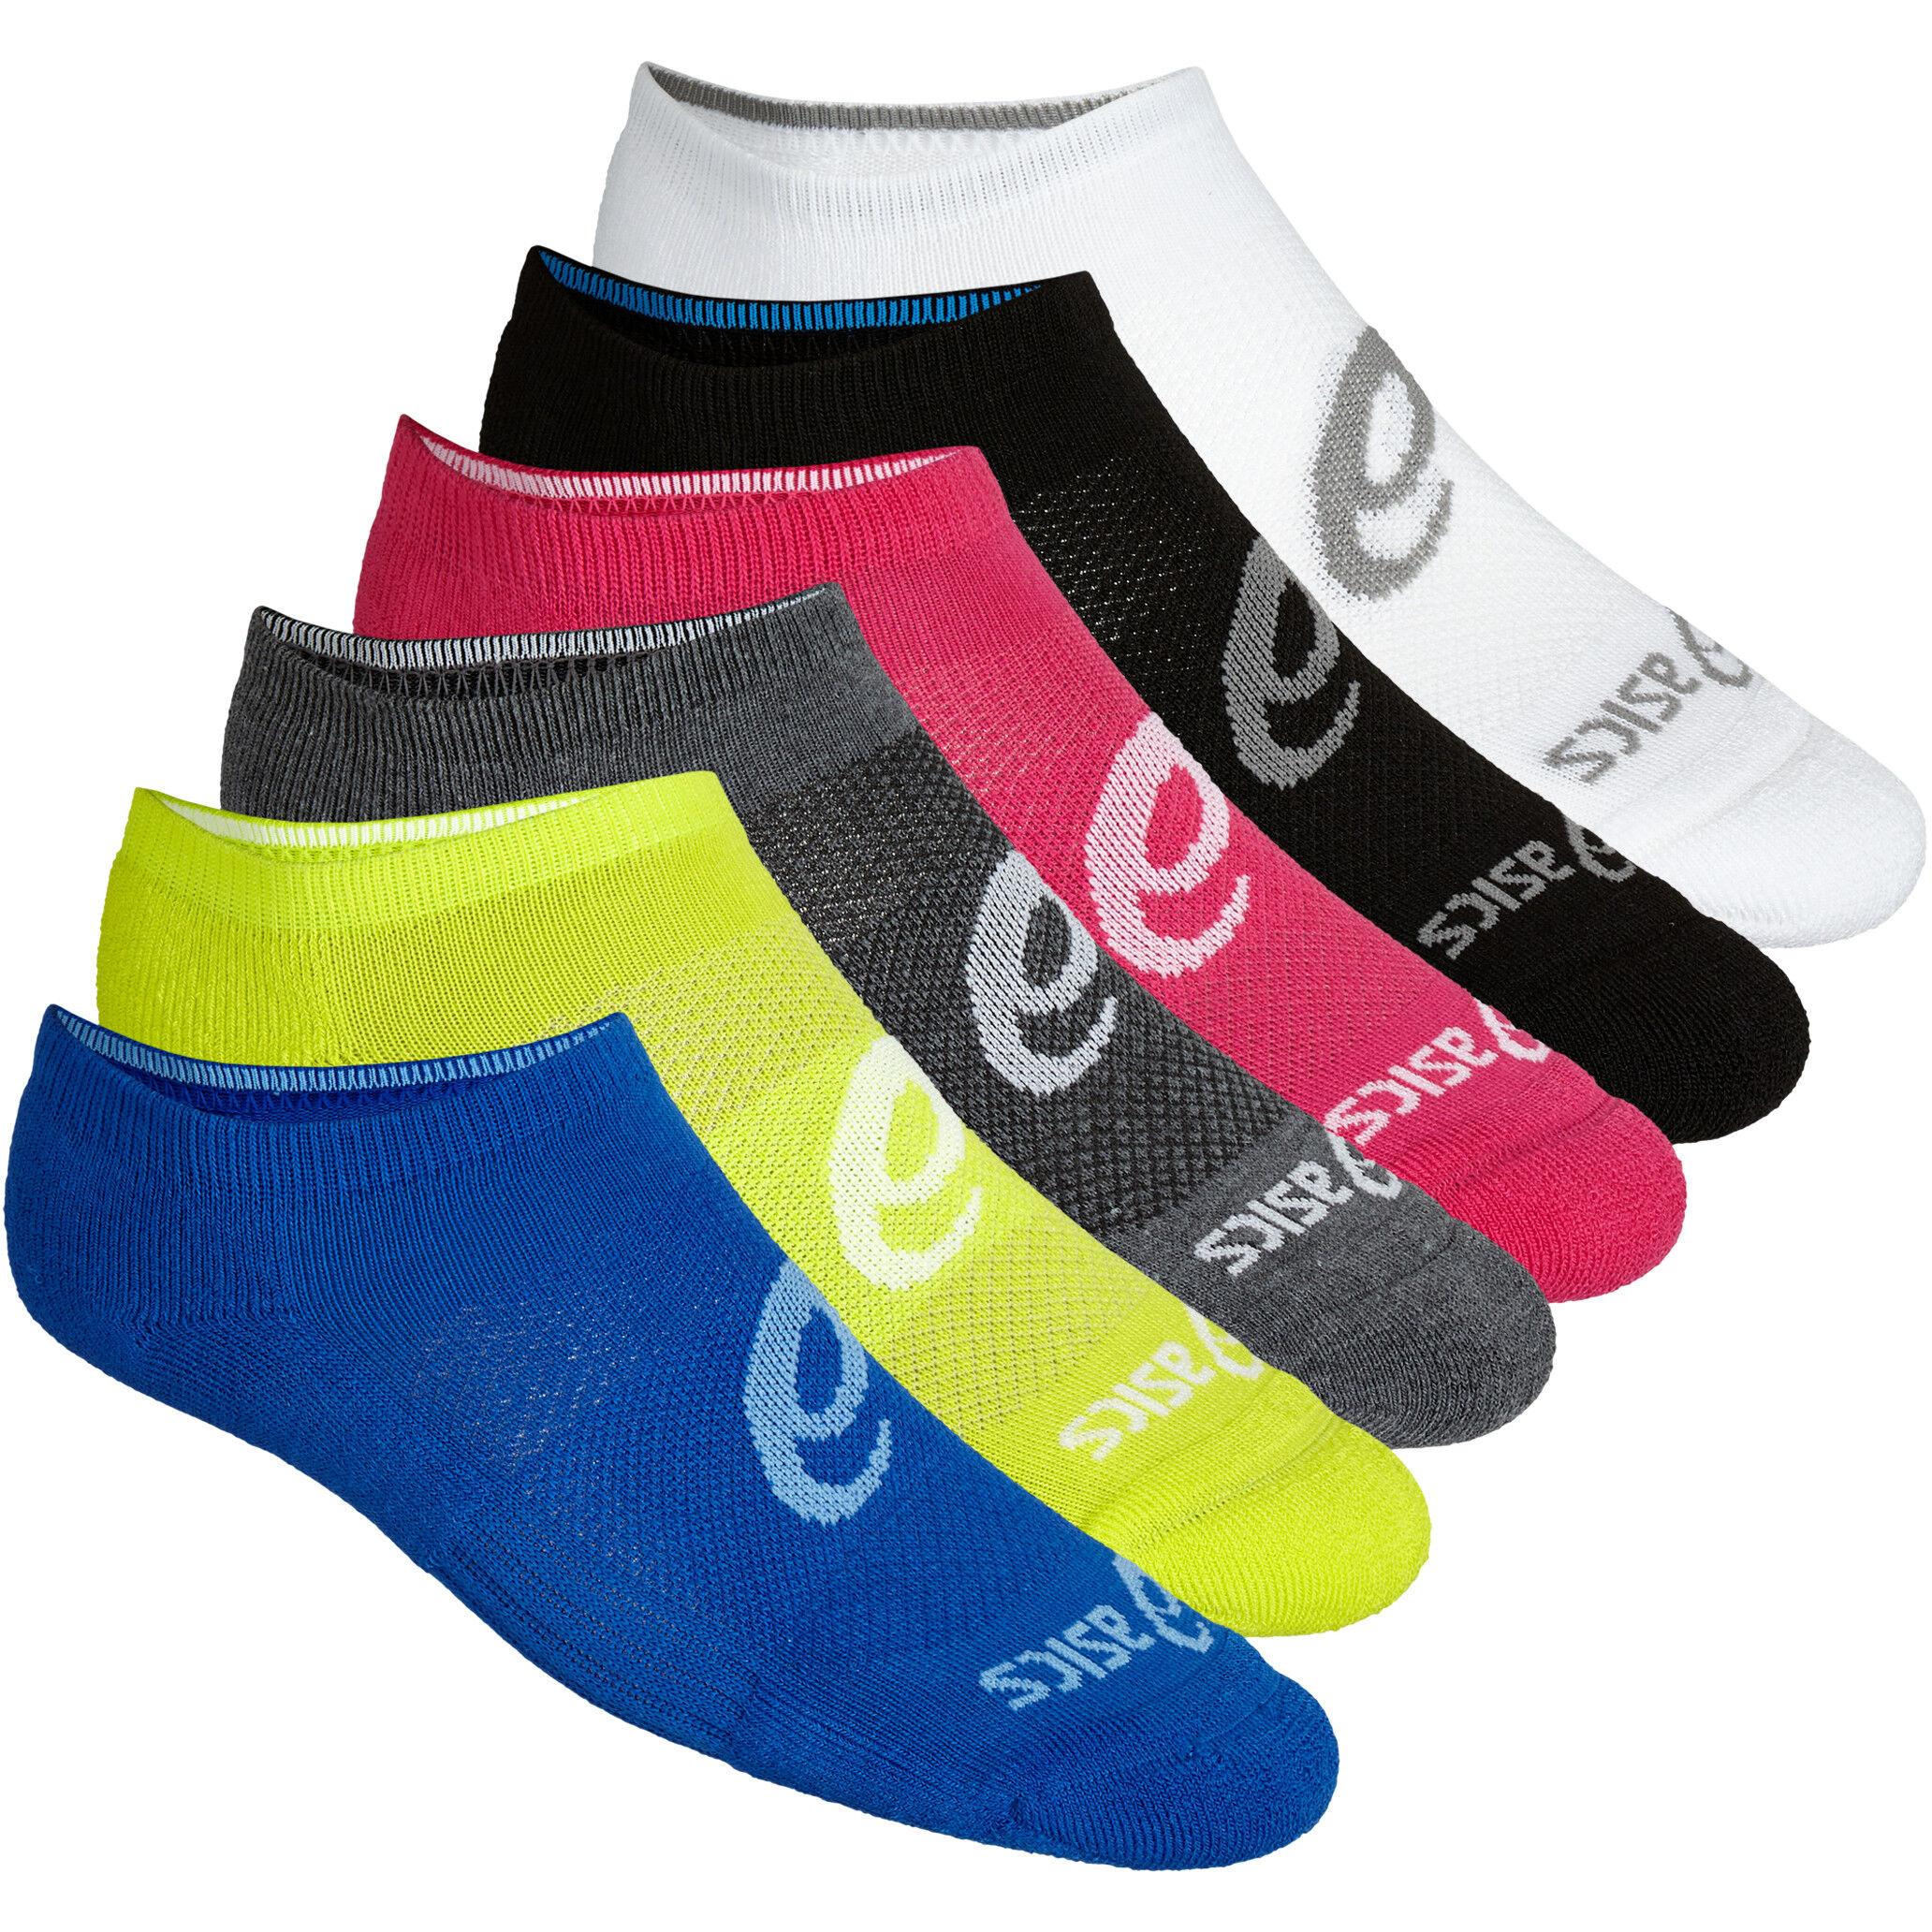 Asics Nimbus Laufsocken Herren Damen Sport Socken Running ...